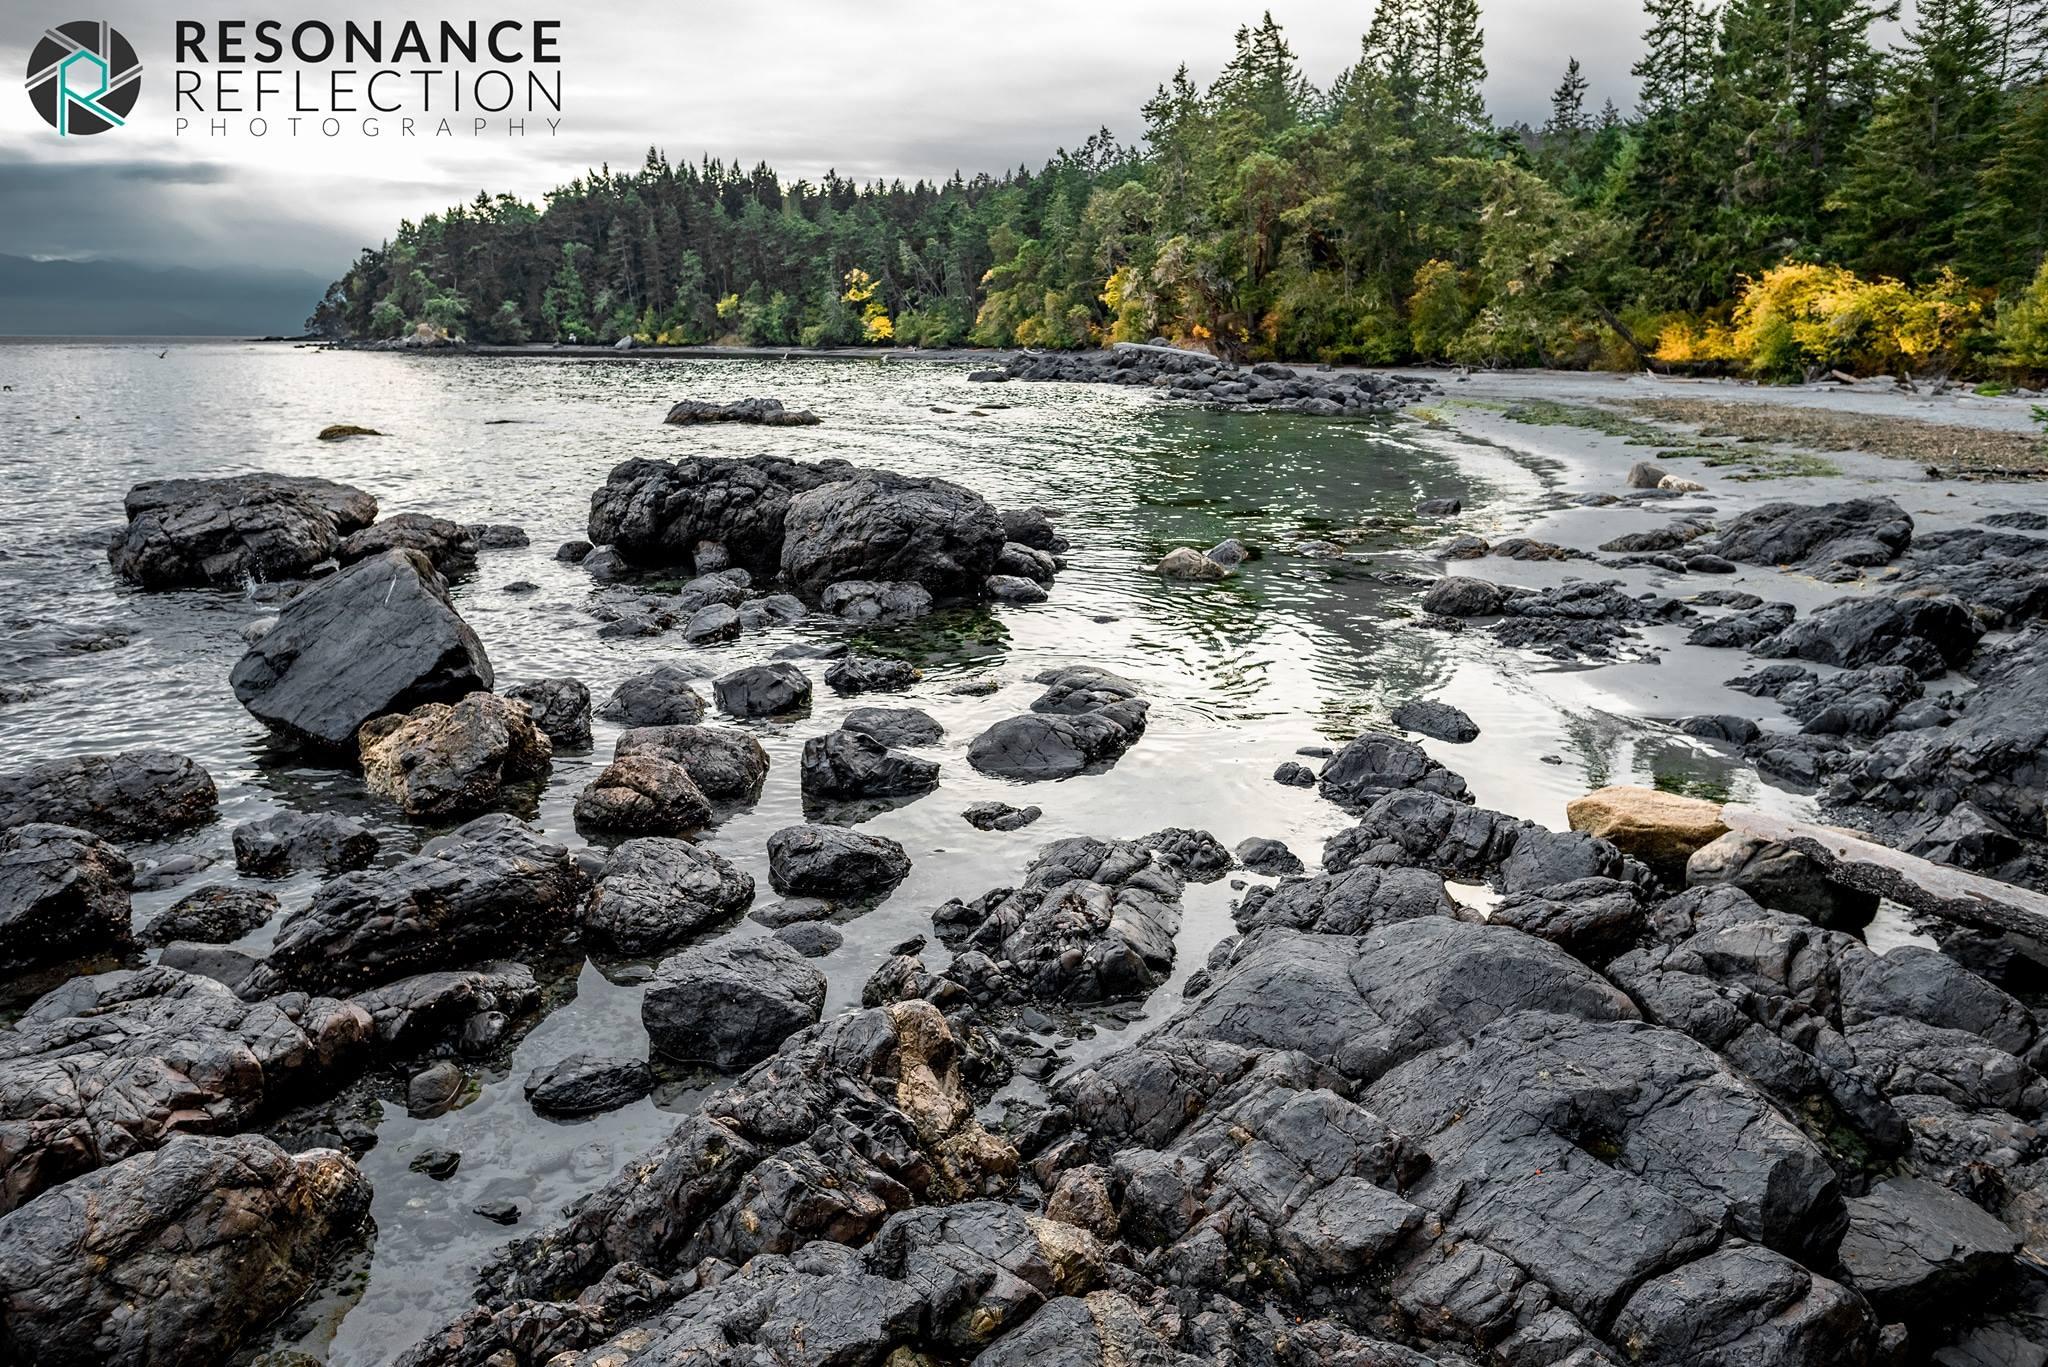 Location: East Sooke Park. Vancouver Island, British Columbia, Canada.